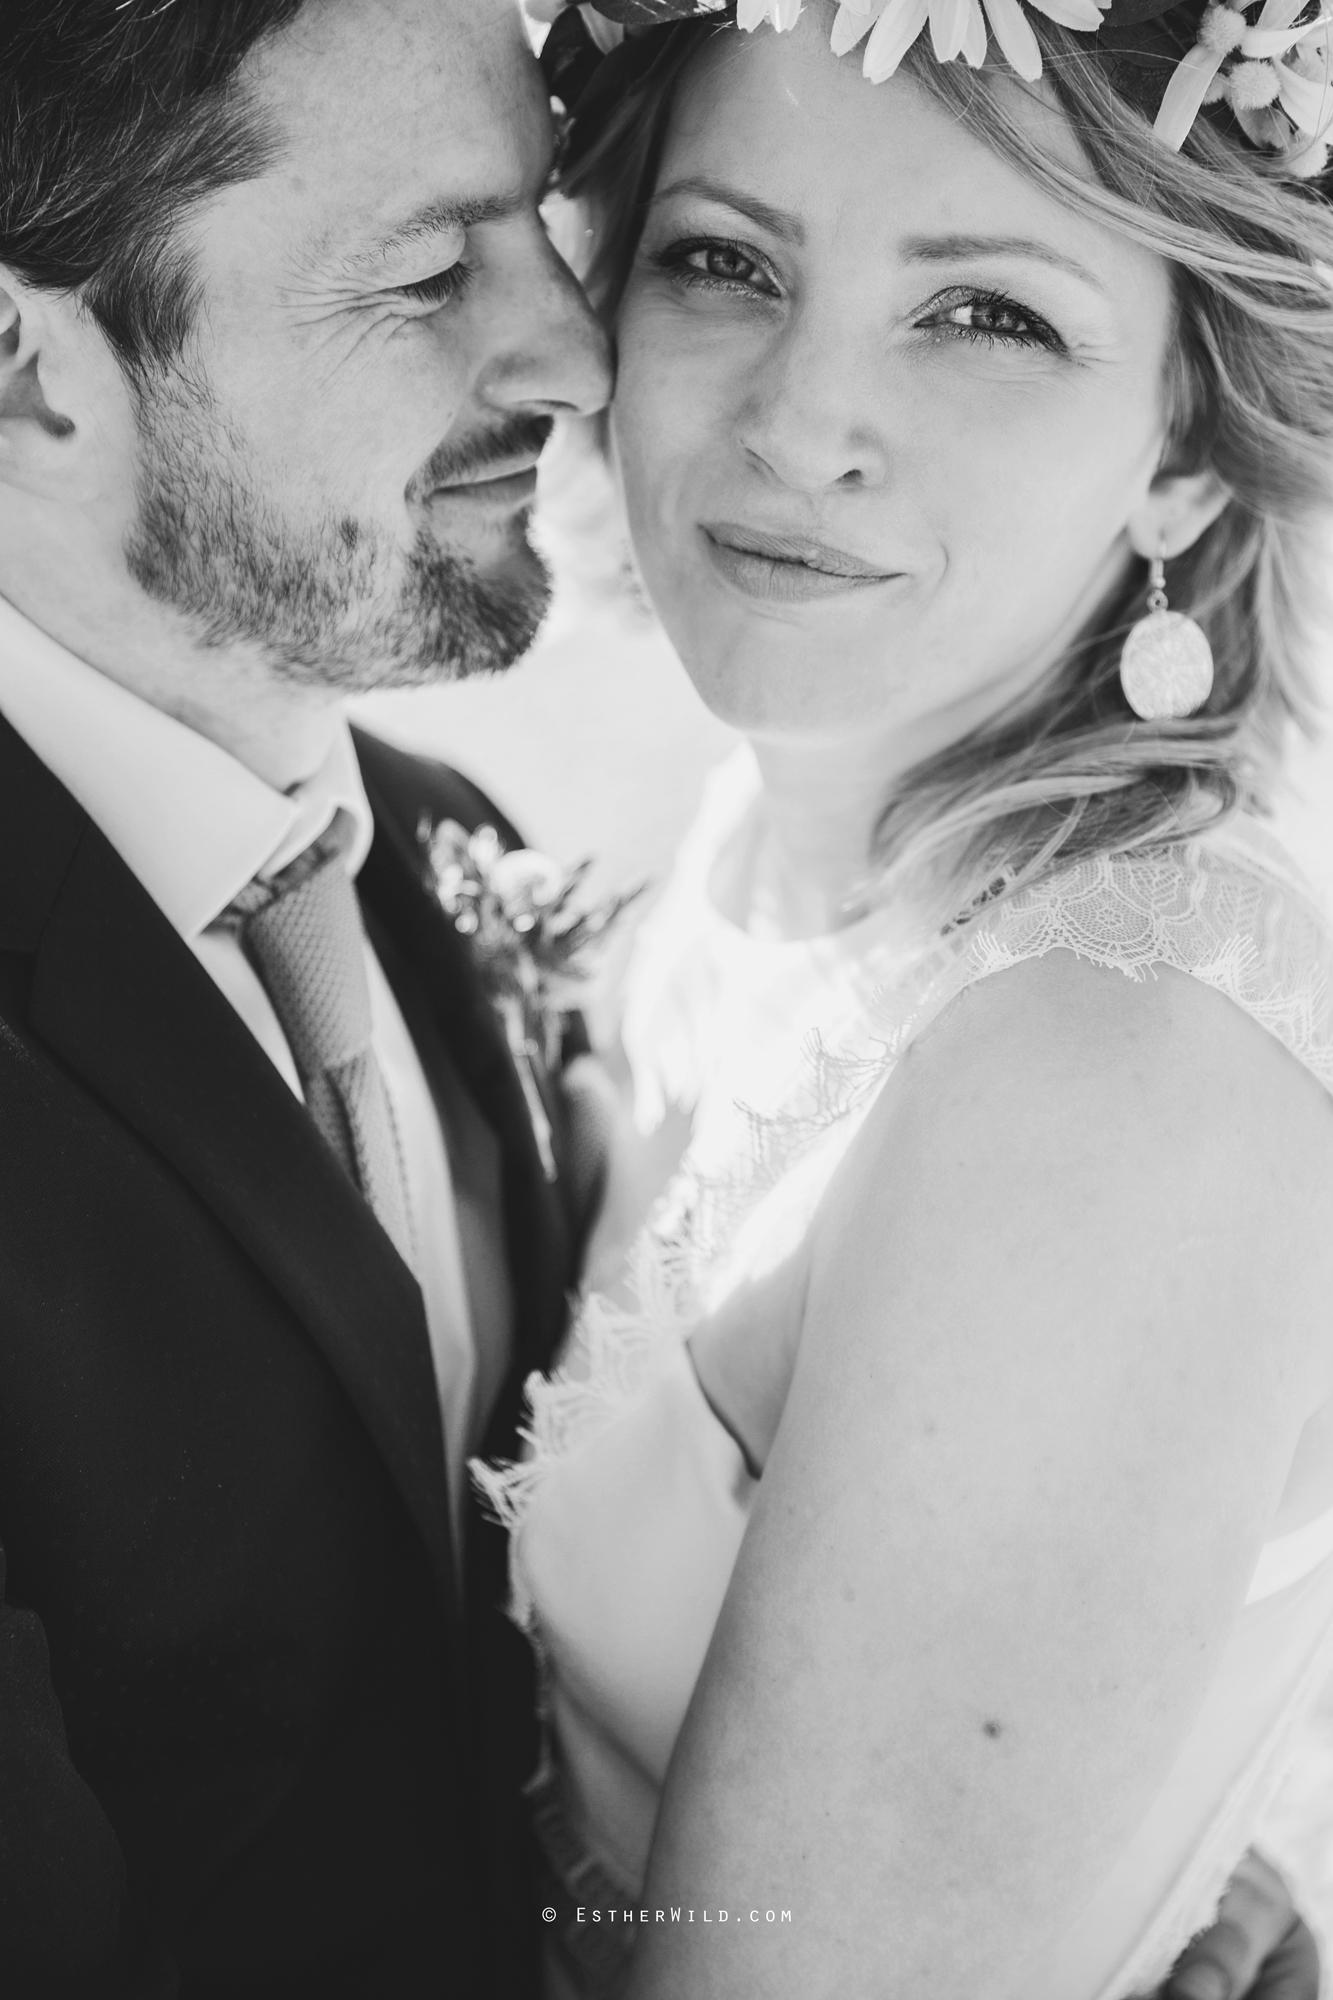 IMG_1317-1Cley_Barn_Drift_Norfolk_Coast_Wedding_Copyright_Esther_Wild_Photographer_.jpg